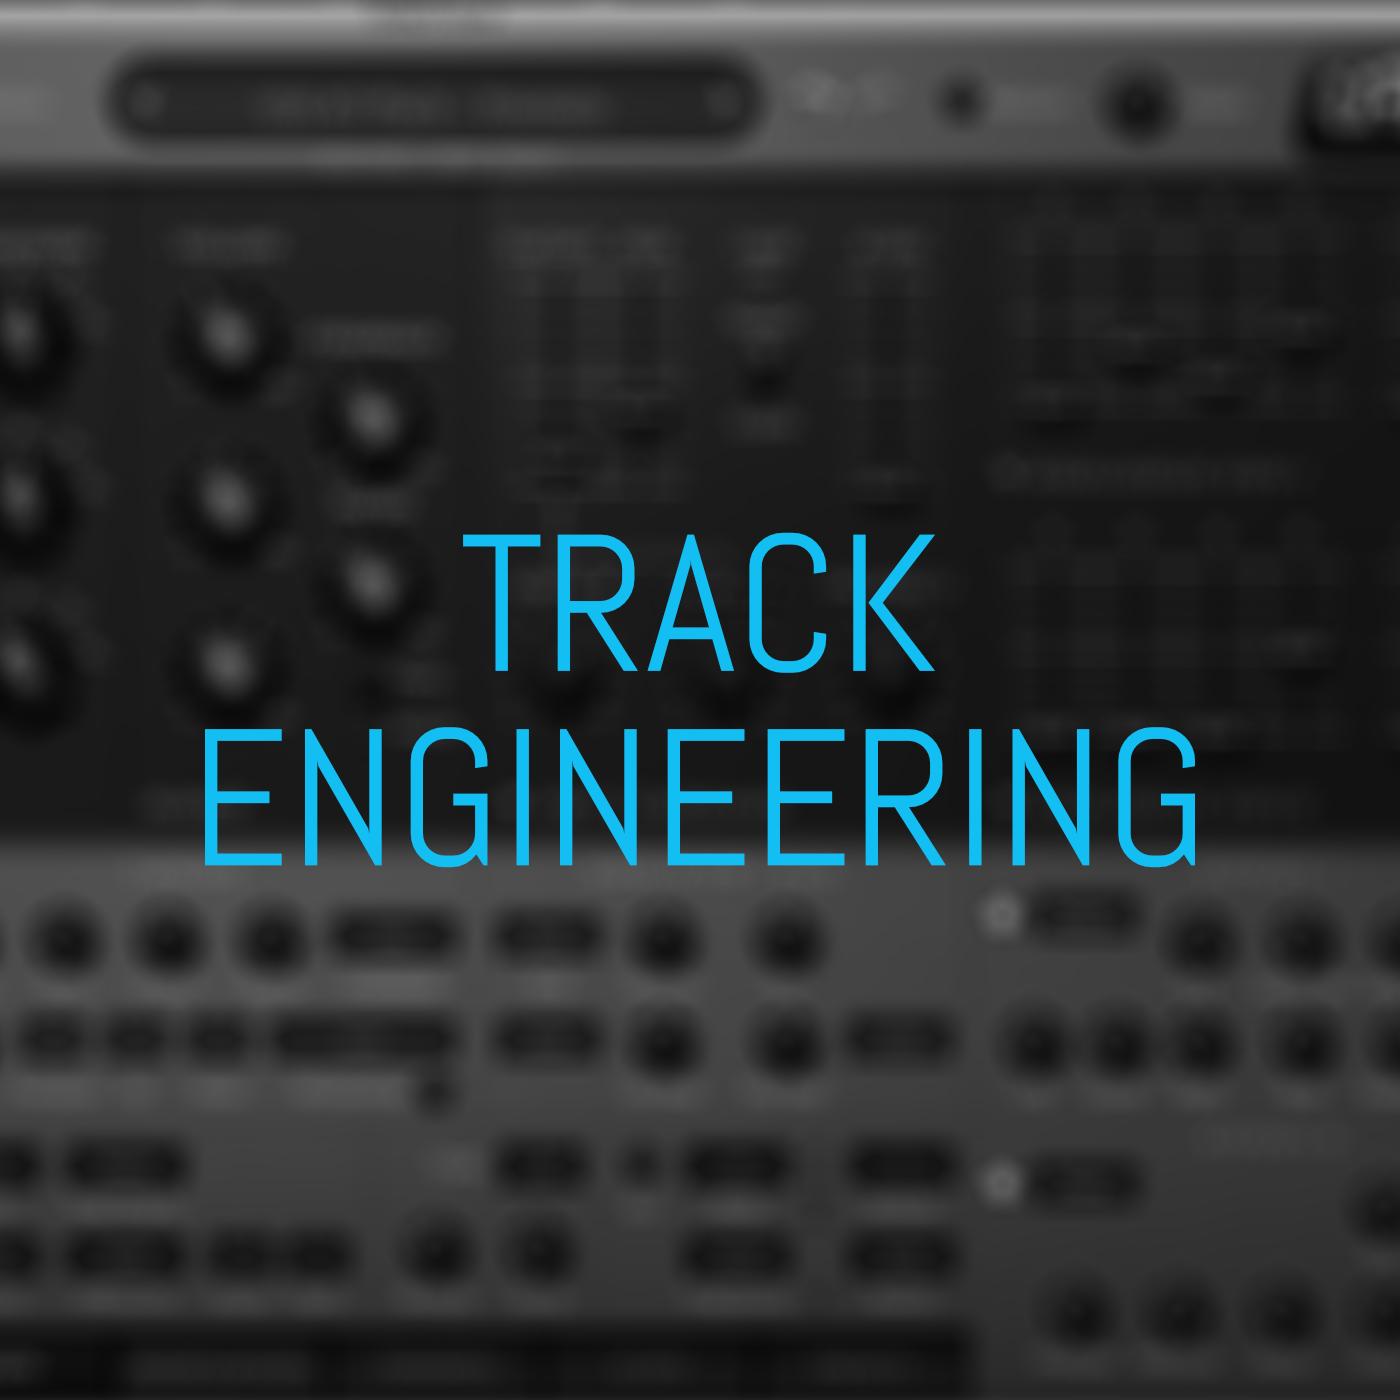 TRACK ENGINEERING IMAGE.jpg